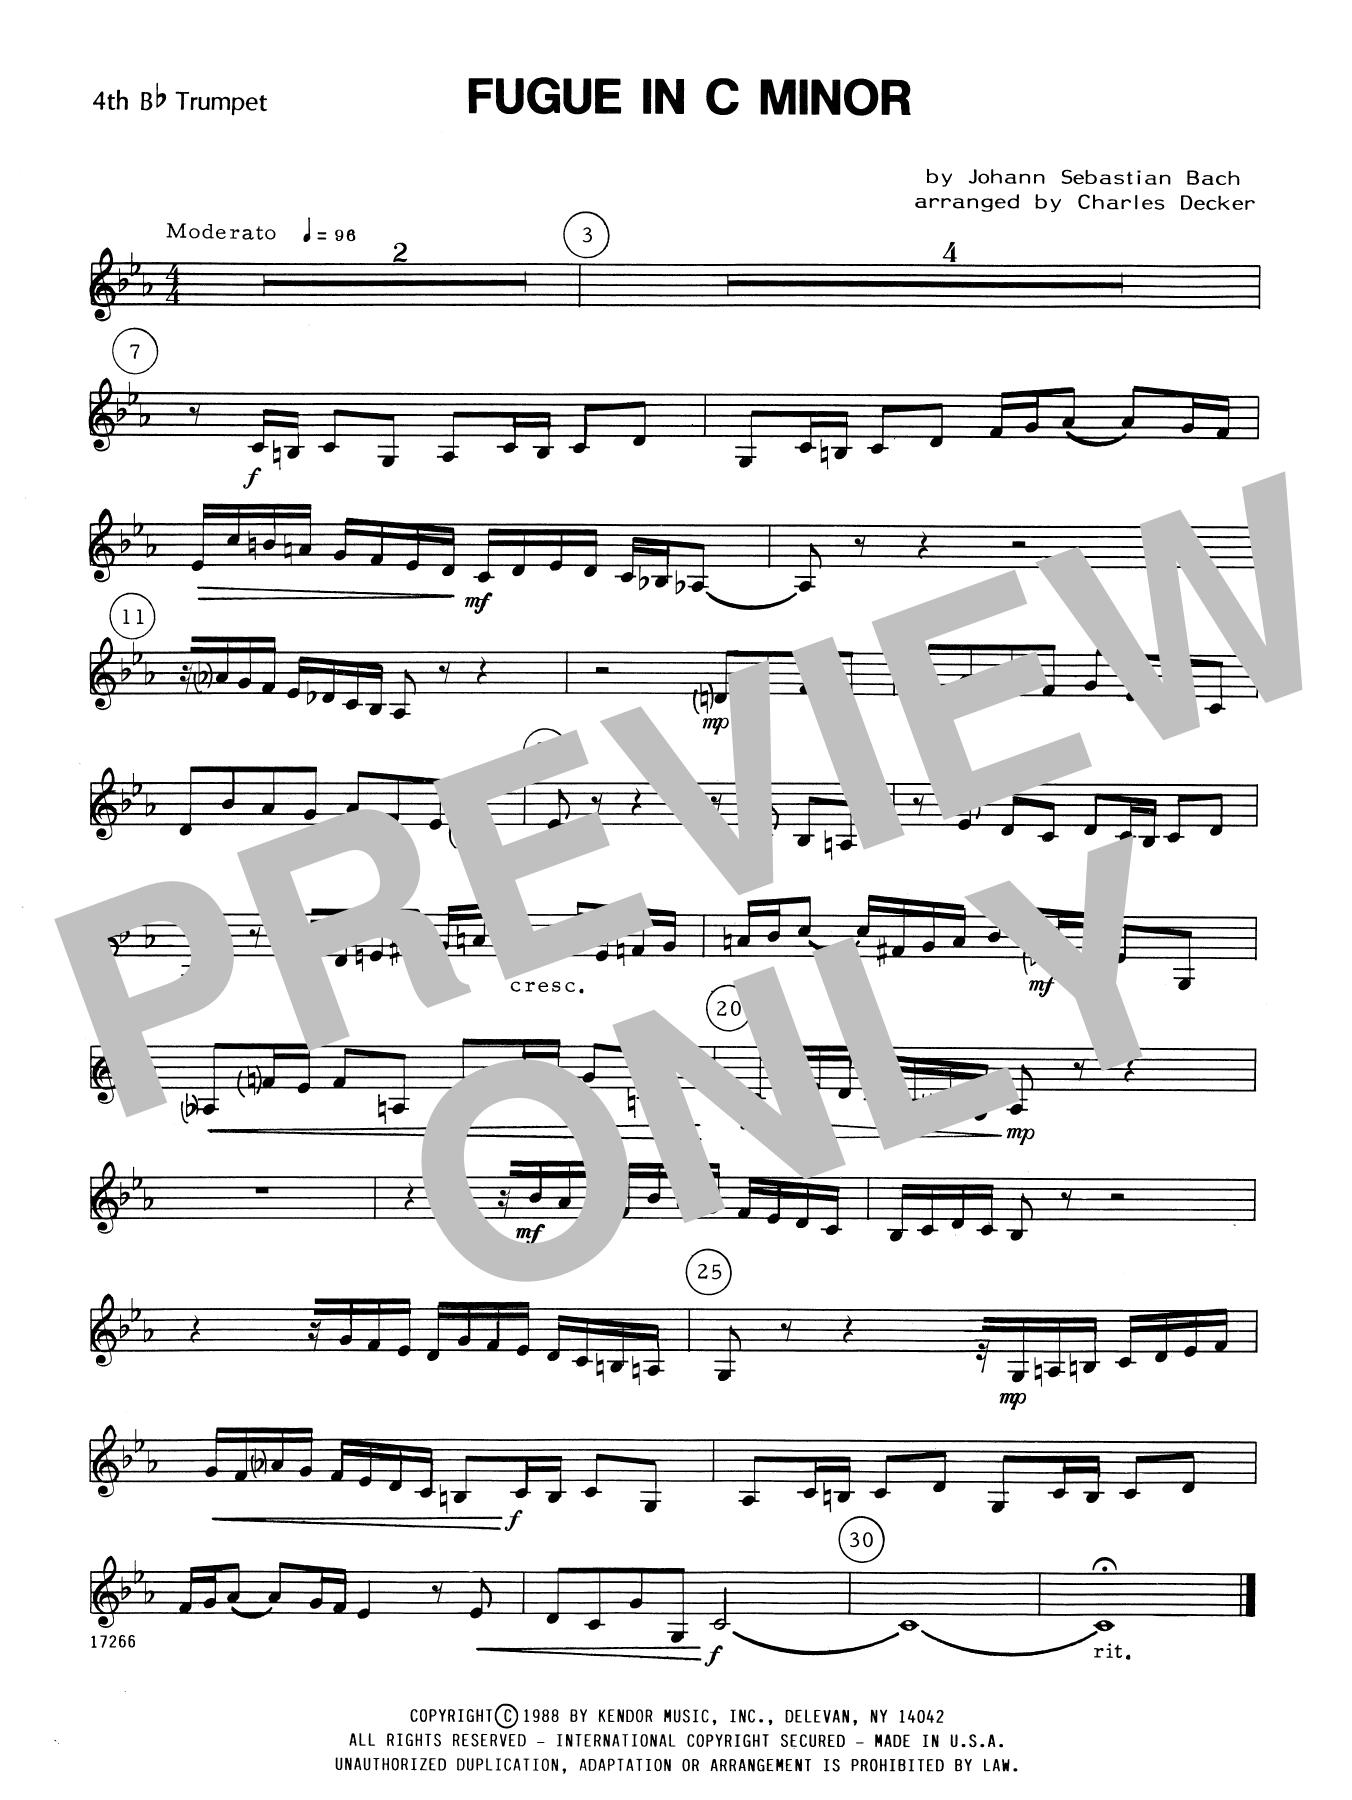 Fugue In C Minor - 4th Bb Trumpet Sheet Music